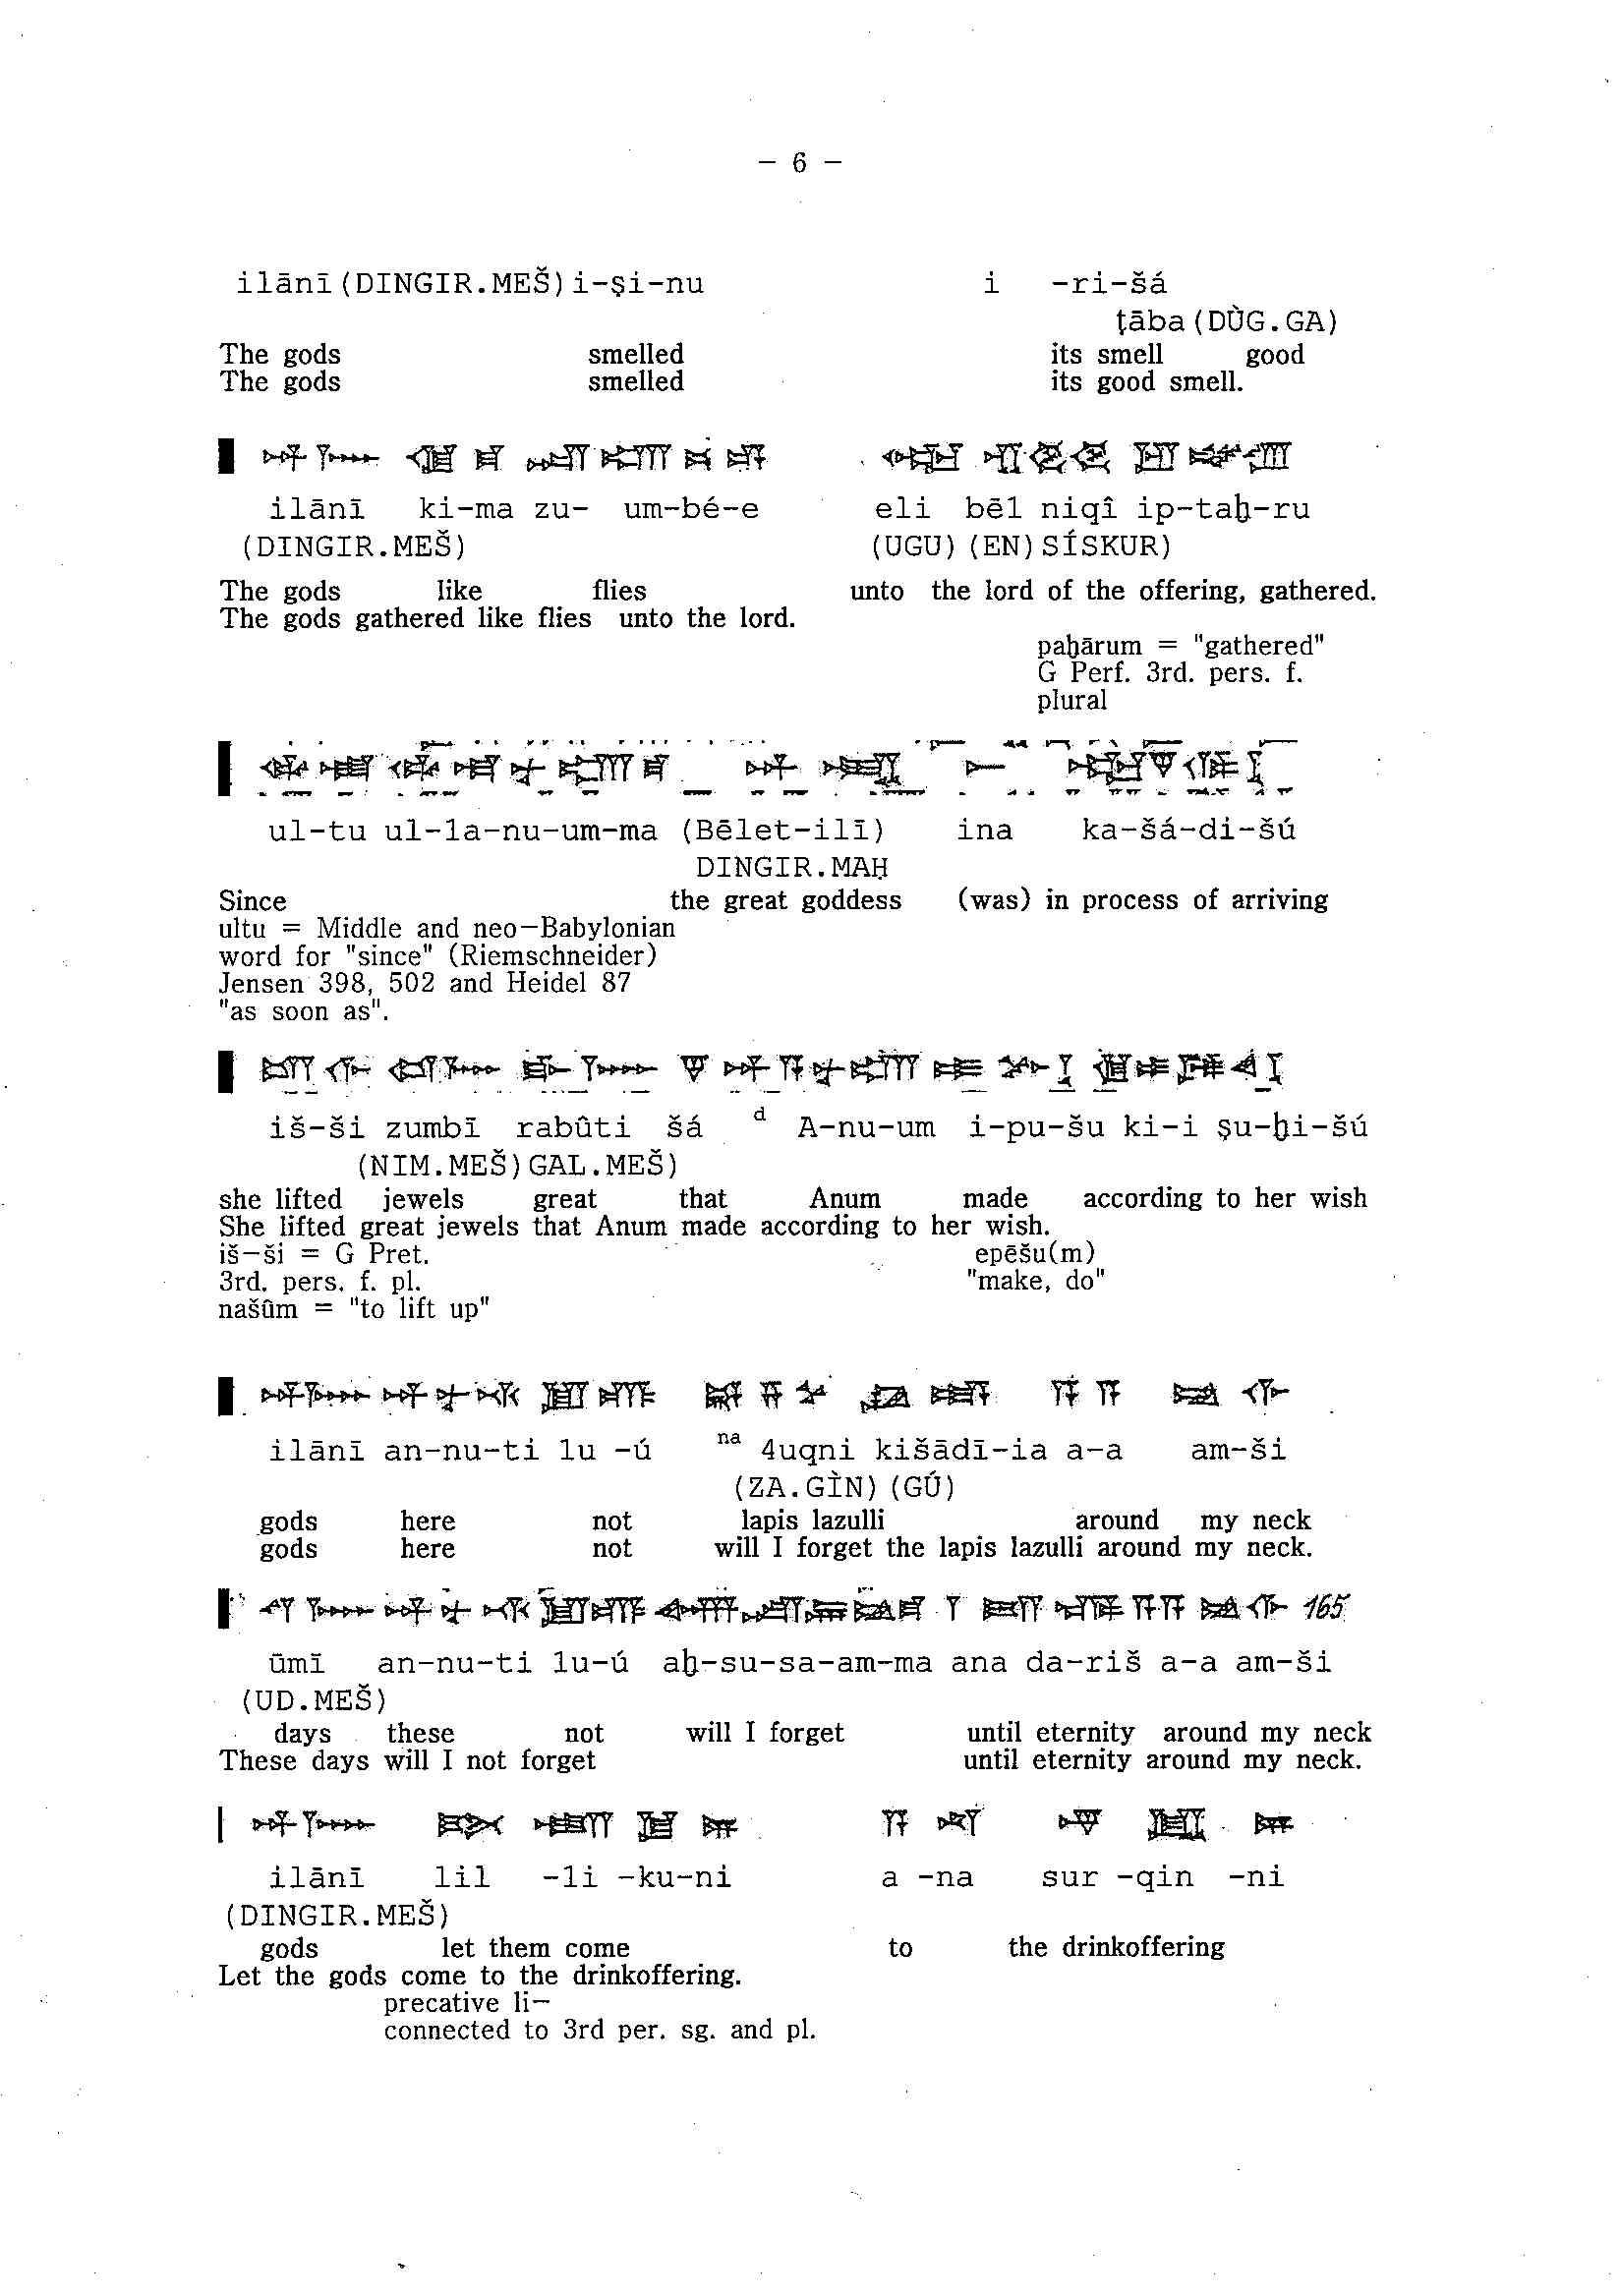 Gilgamesh Epic Tablet XI lines 127 to 167 (6).jpg